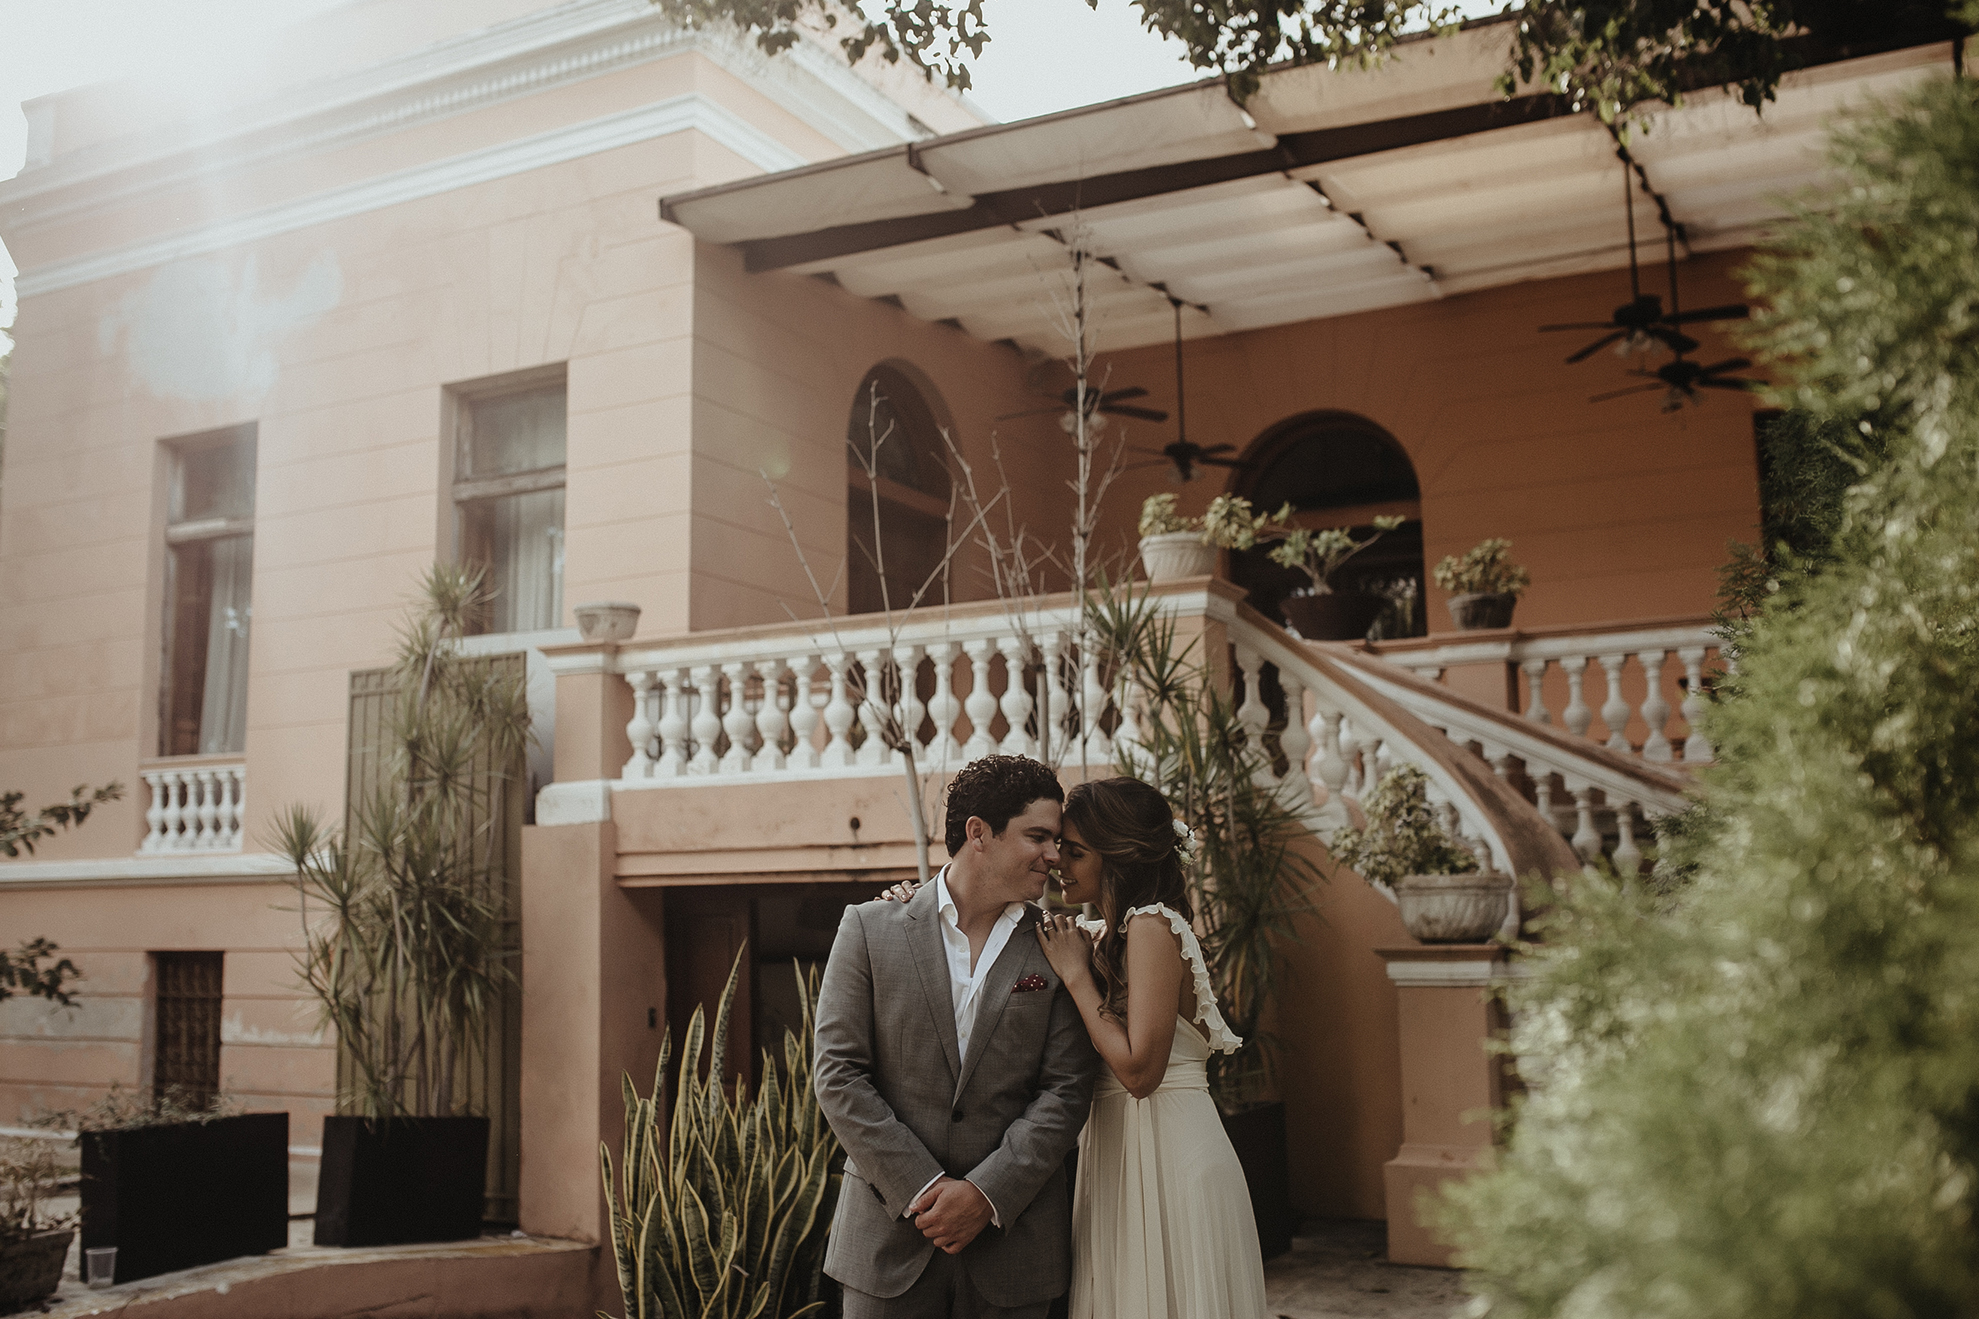 0016civil_Hacienda_WeddingDstination_MeridaYucatan_HaciendasMerida_BodasMexico_BodasYucatan_Boda_Destino.jpg